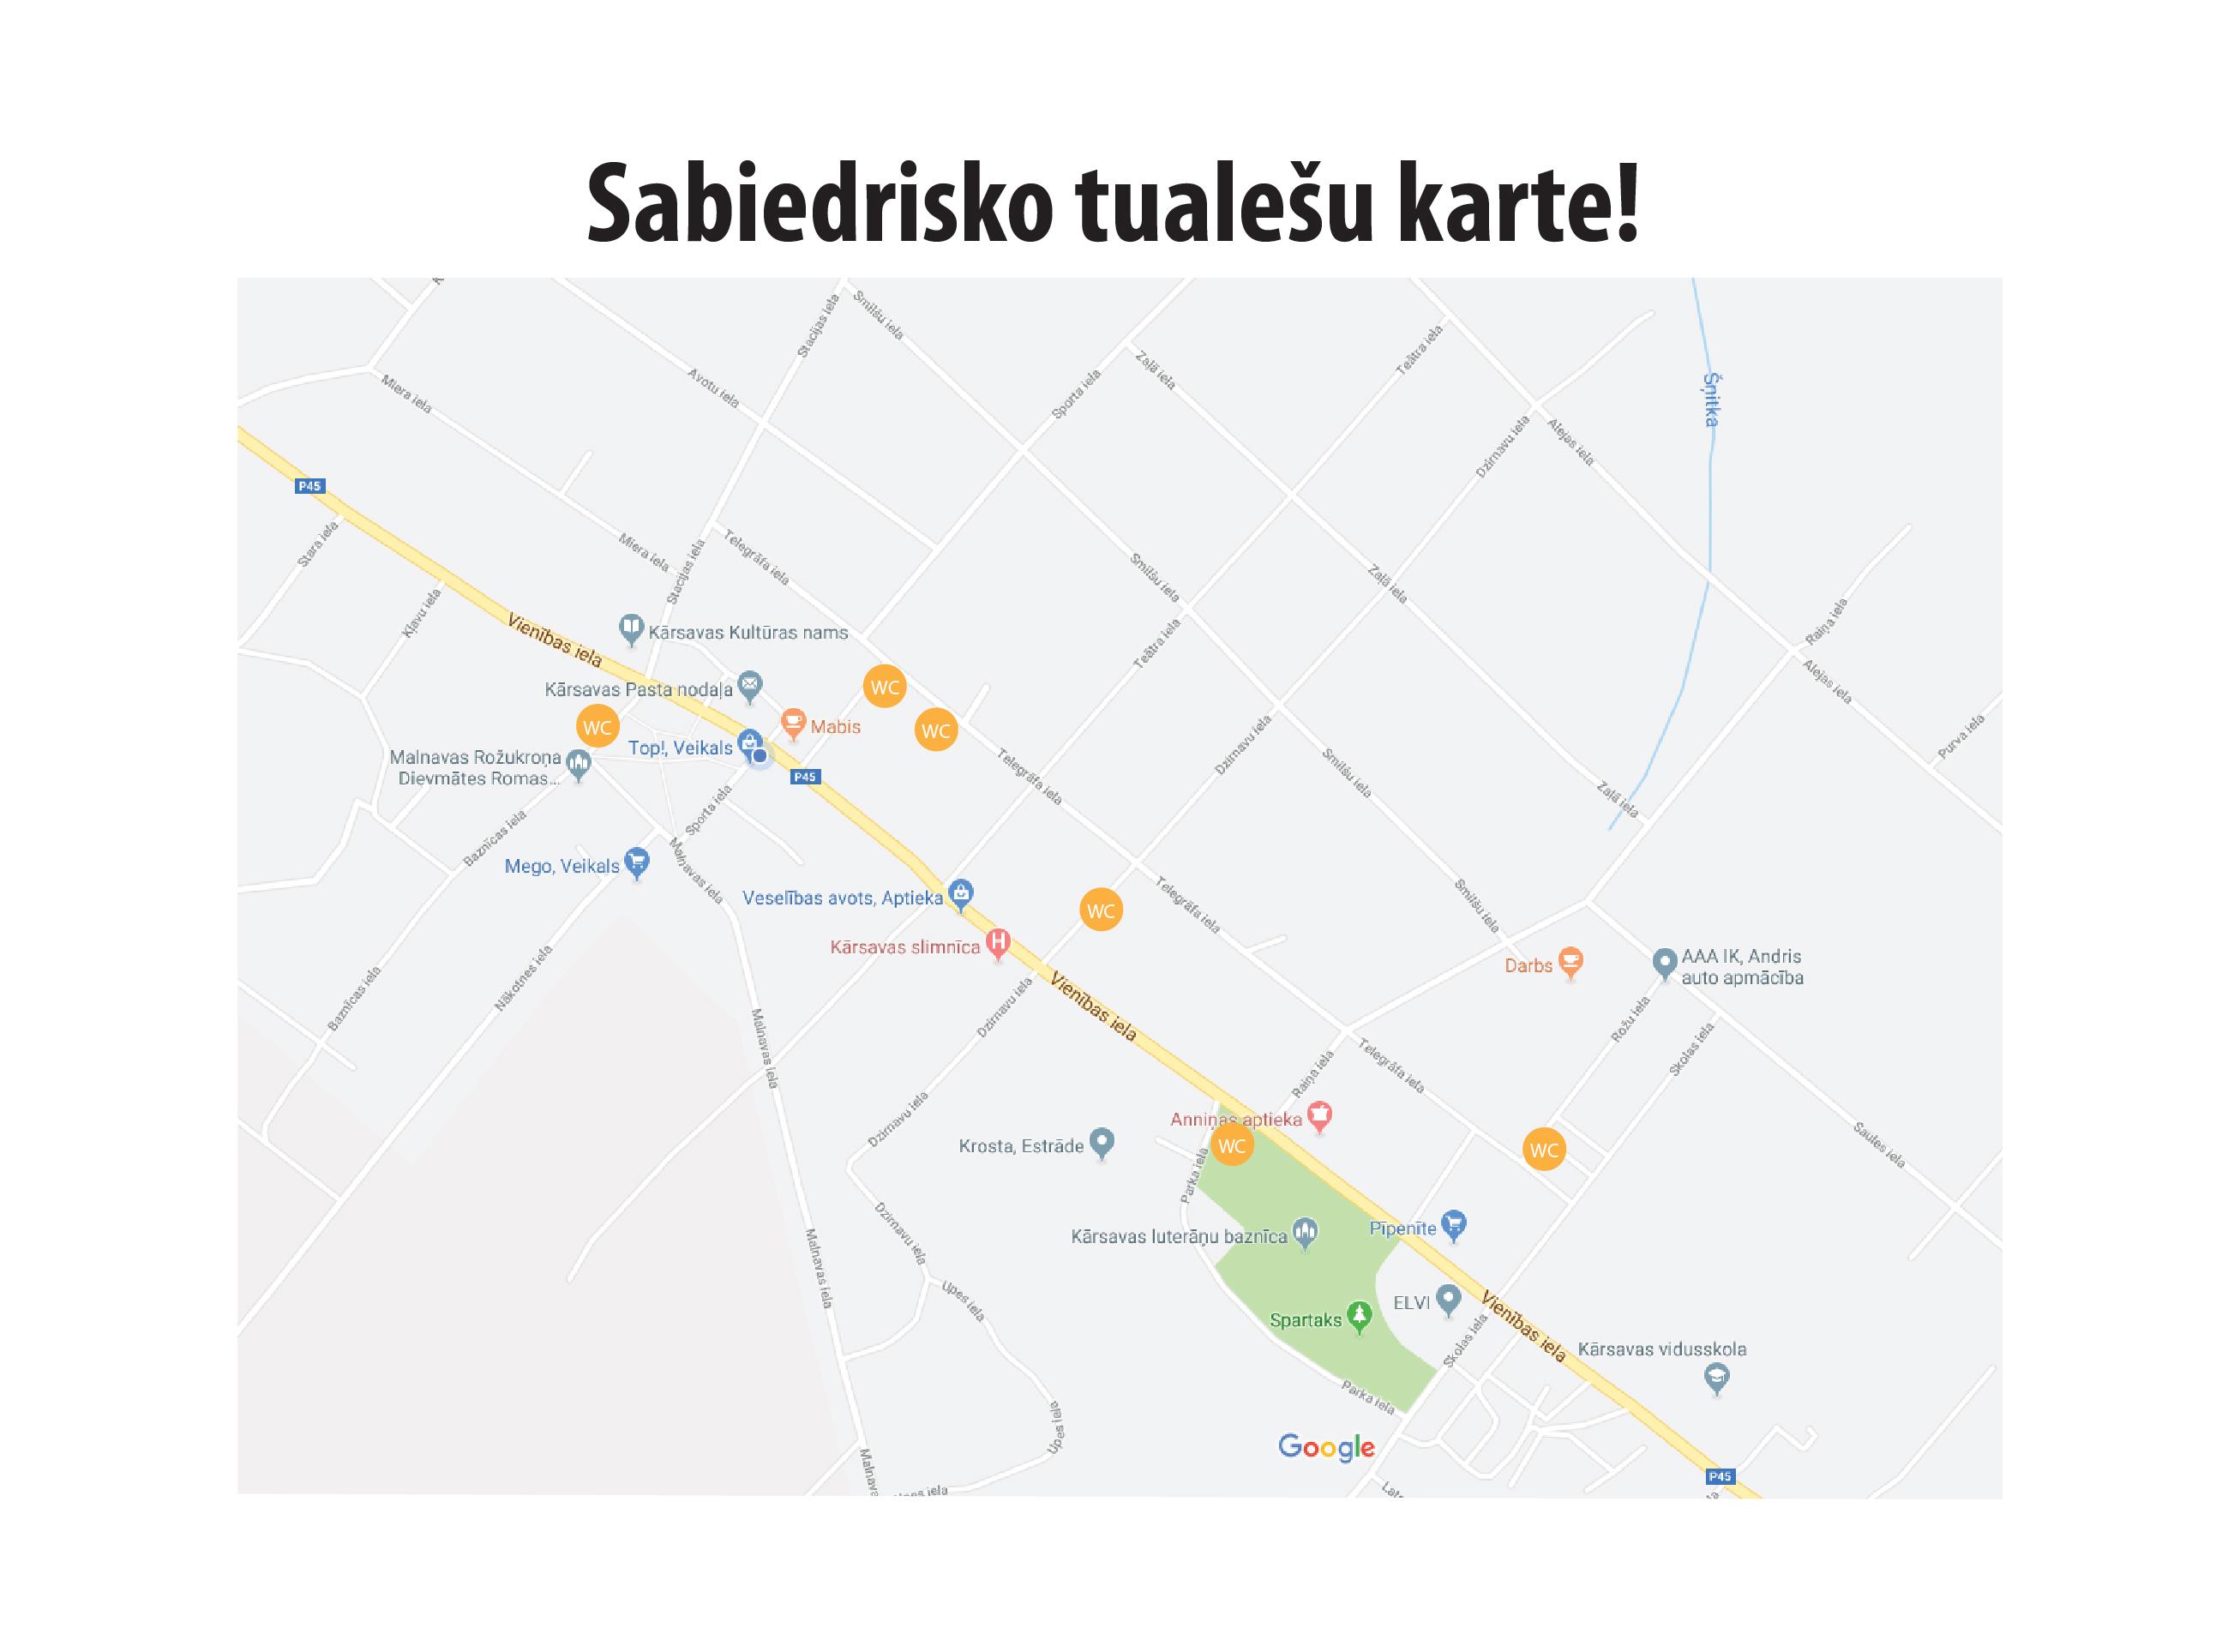 sabiedrisko-wc-karte-2